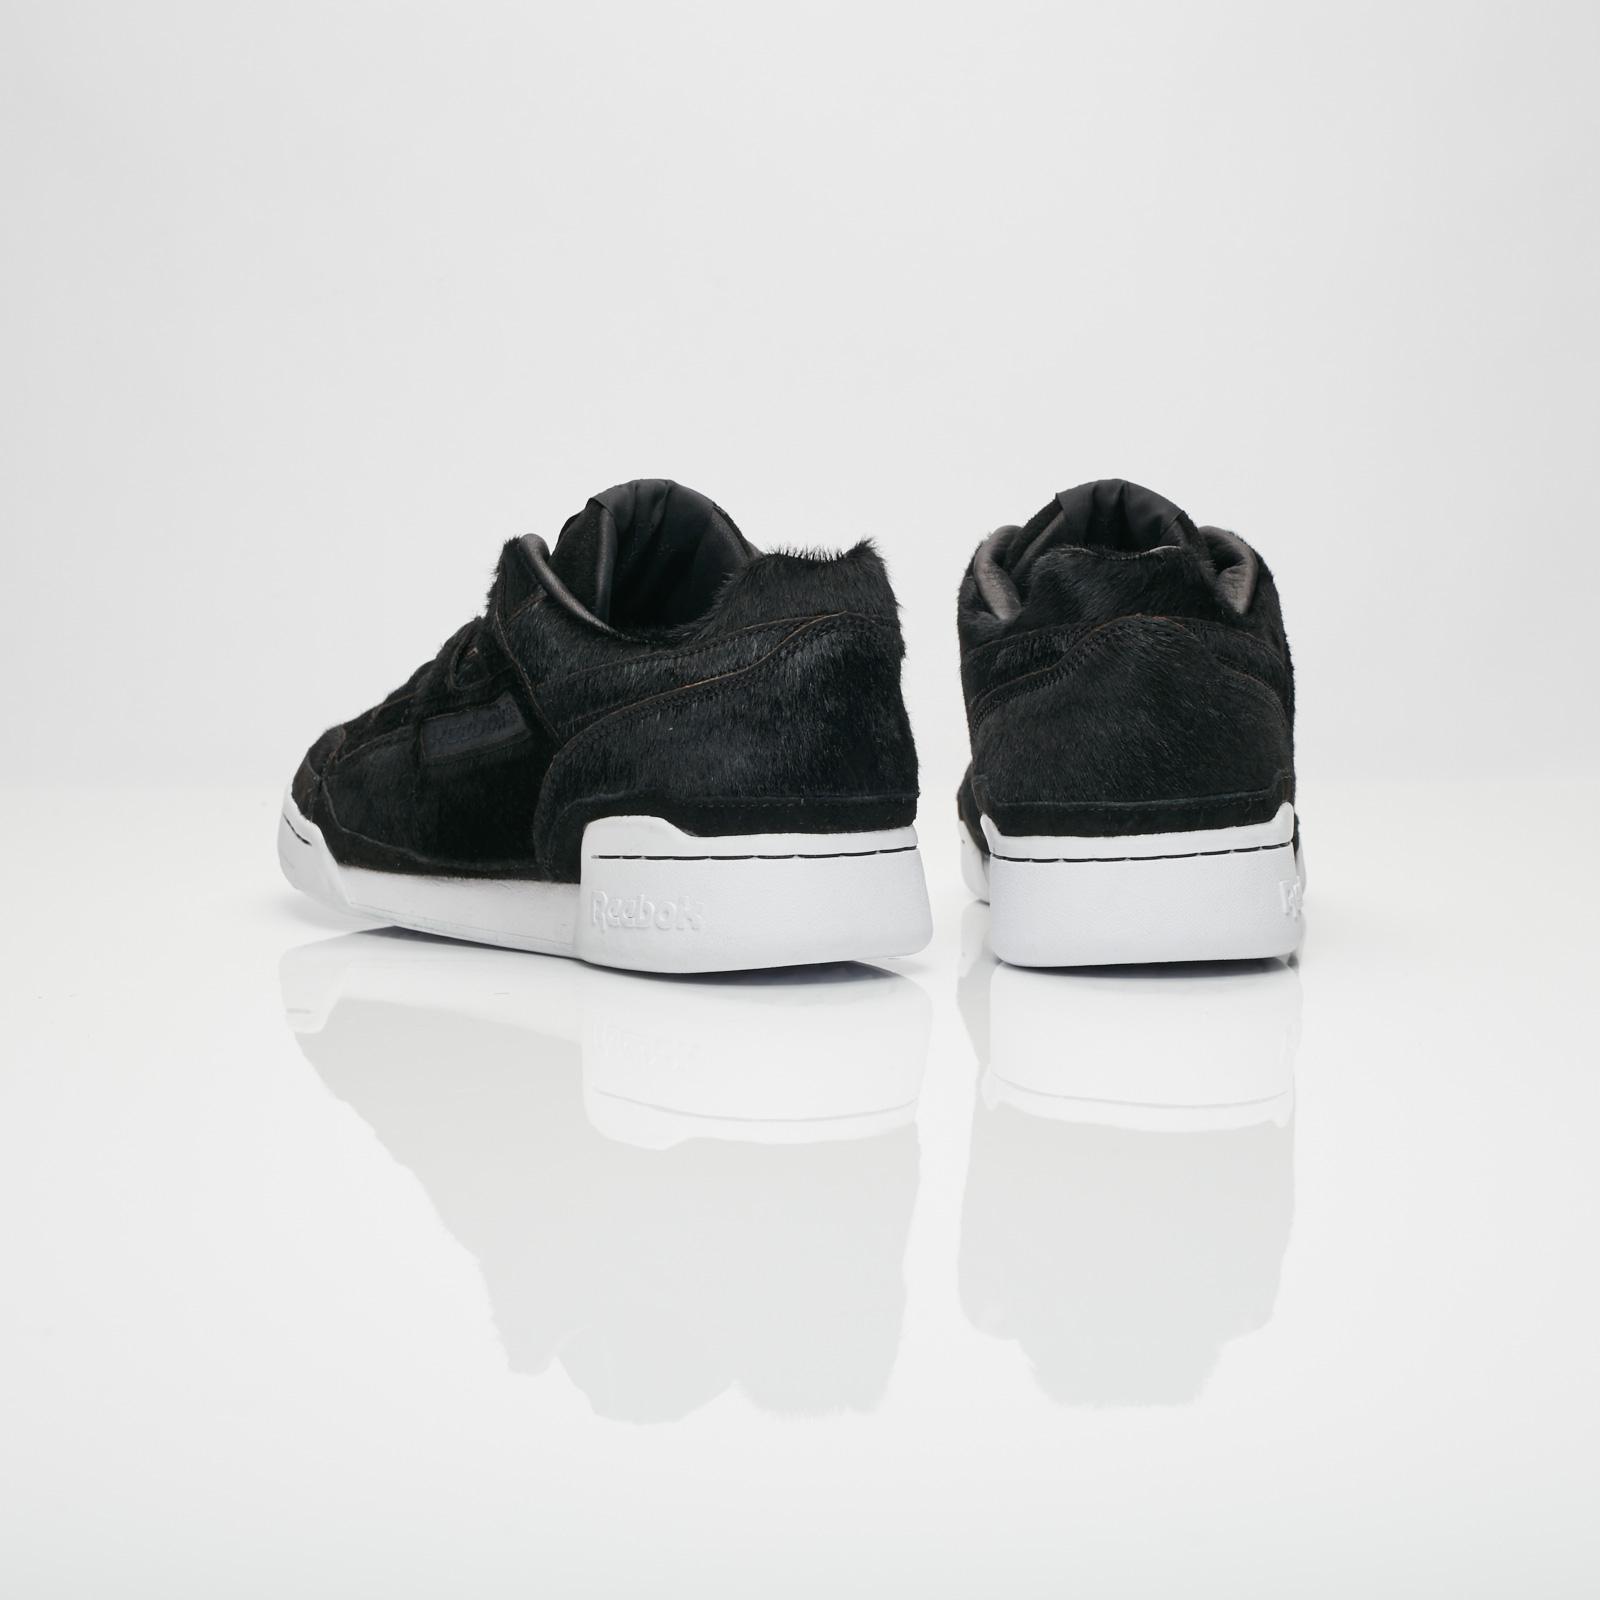 6bc7c0a02b7c Reebok Workout Lo Plus x Head Porter - Cn2033 - Sneakersnstuff ...